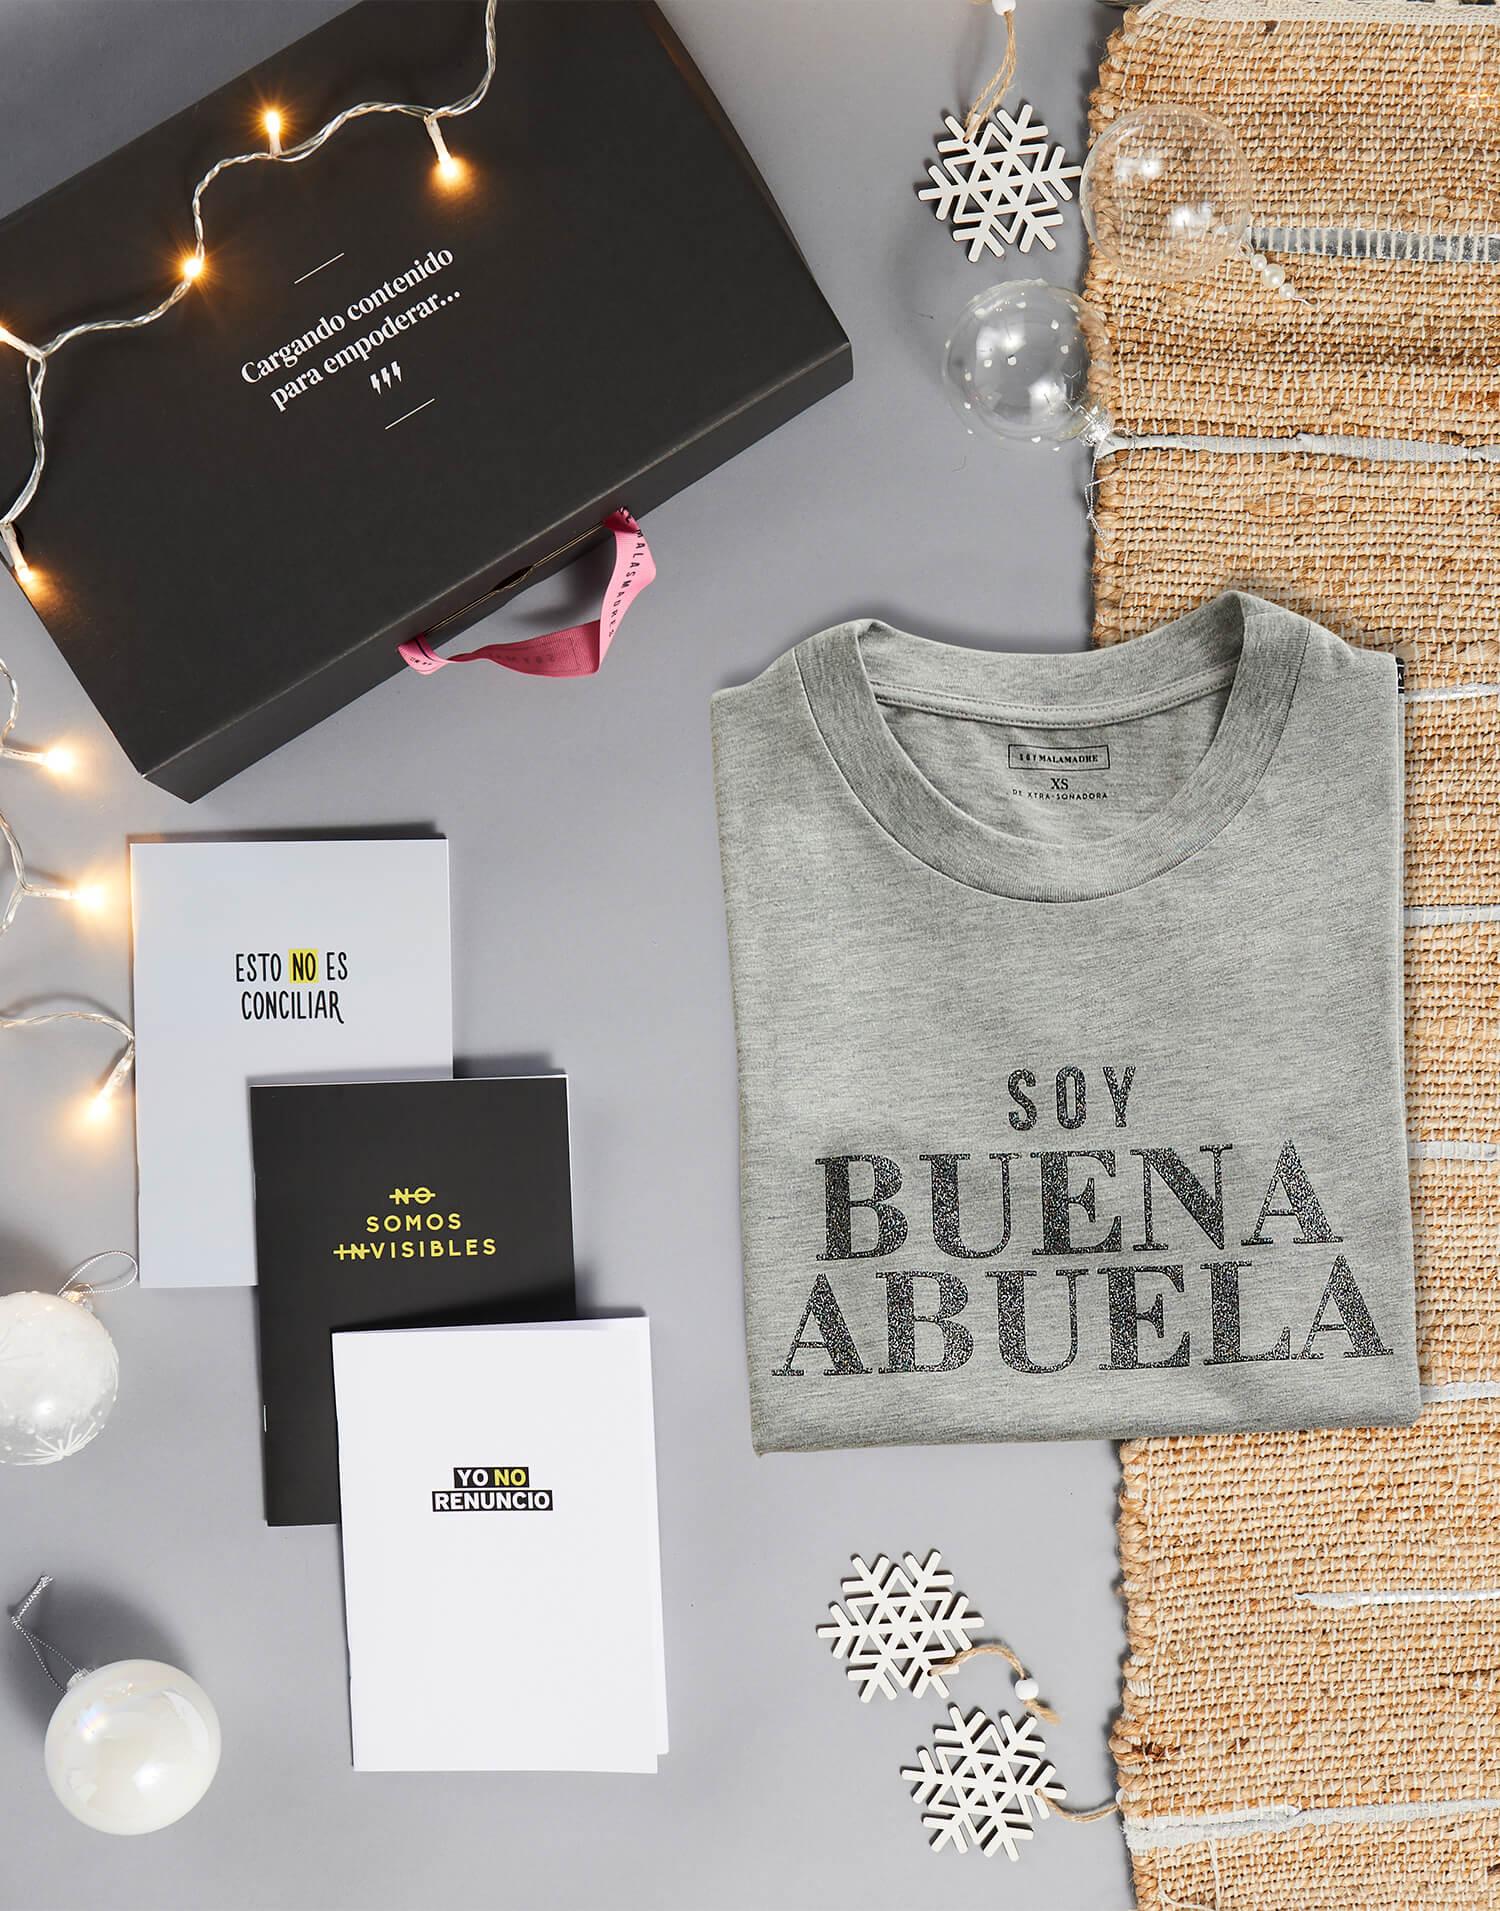 Kit Camiseta + Libretas para buenasabuelas